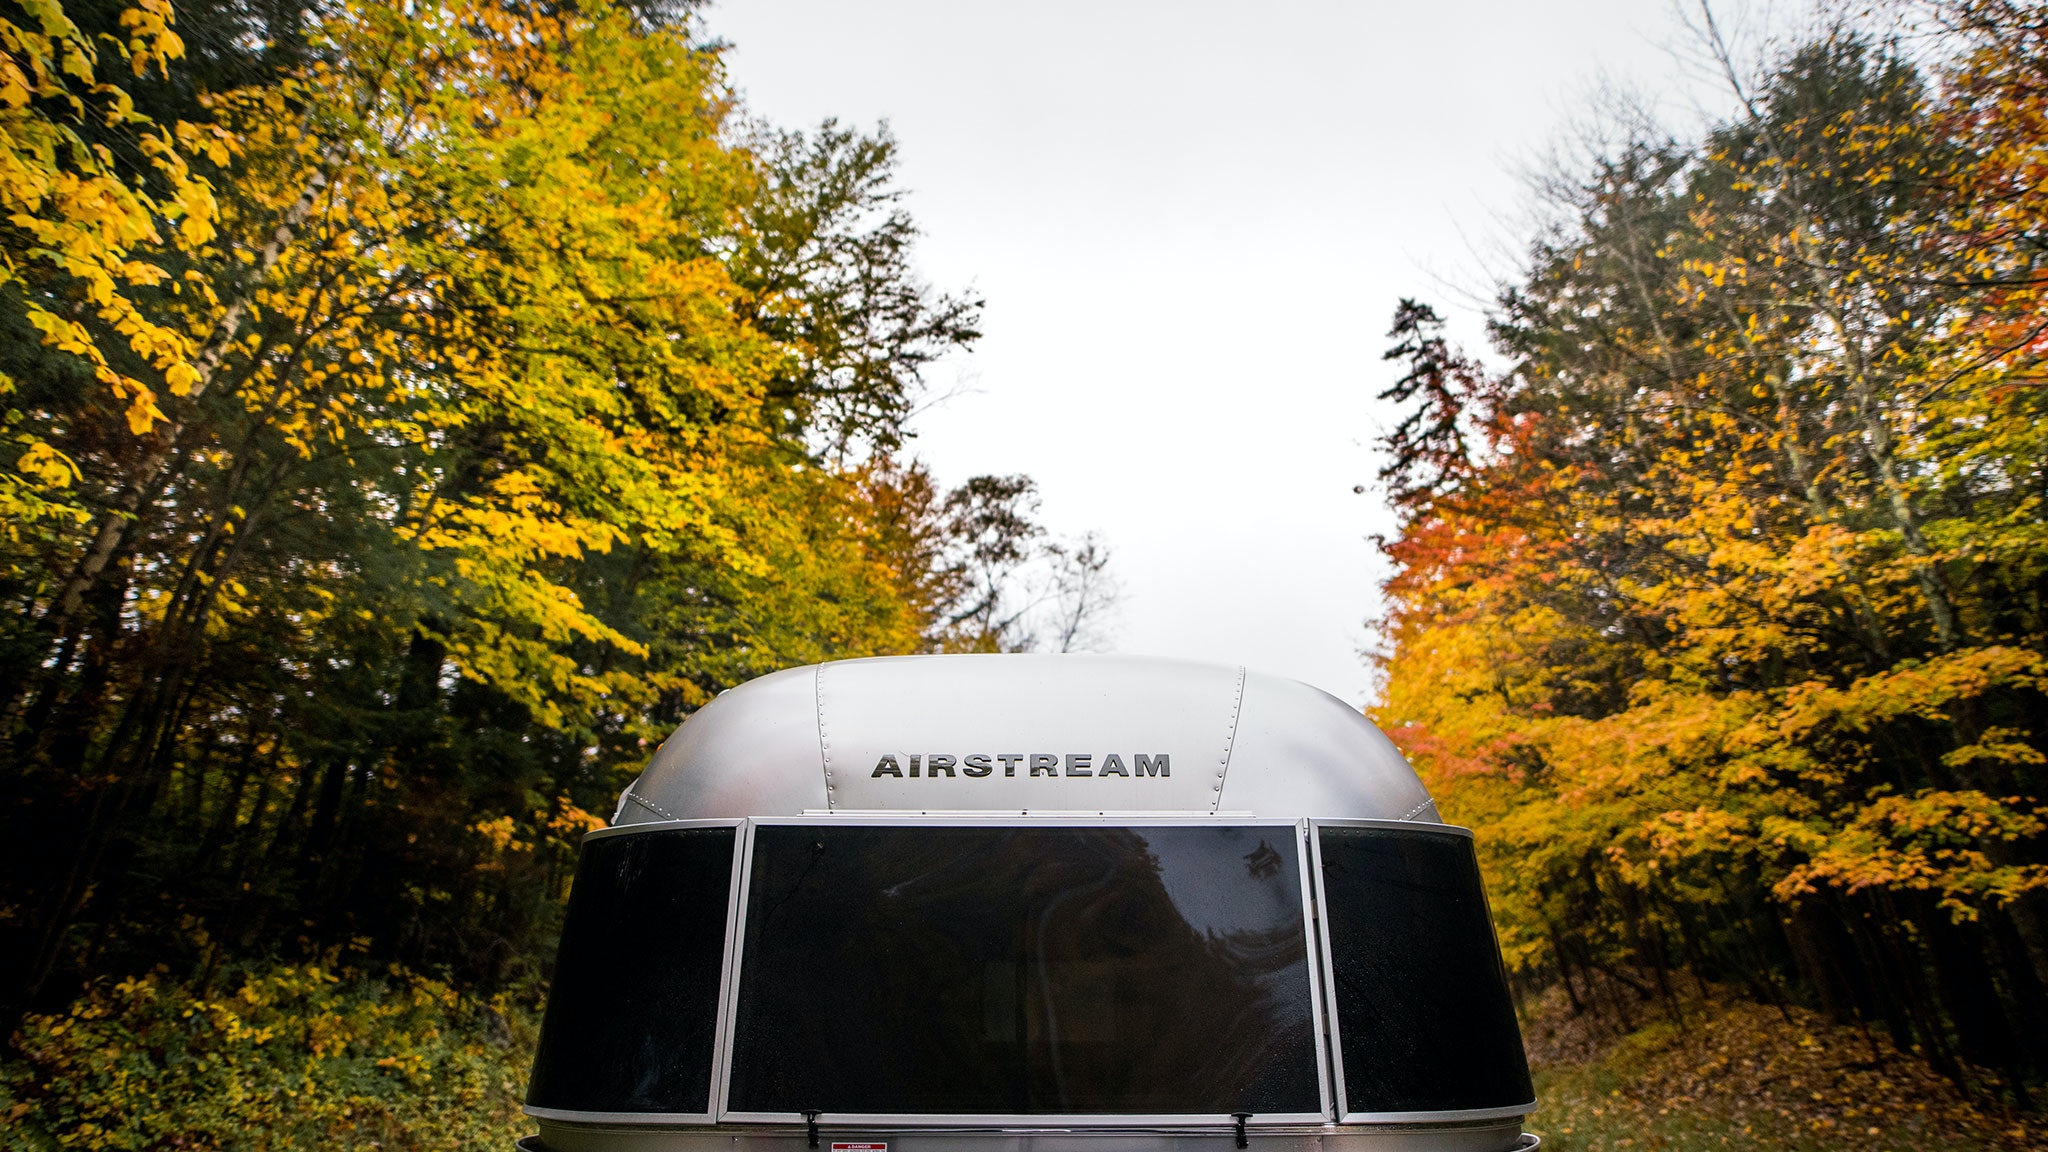 airstream-2021-fall-foliage-camping-banner